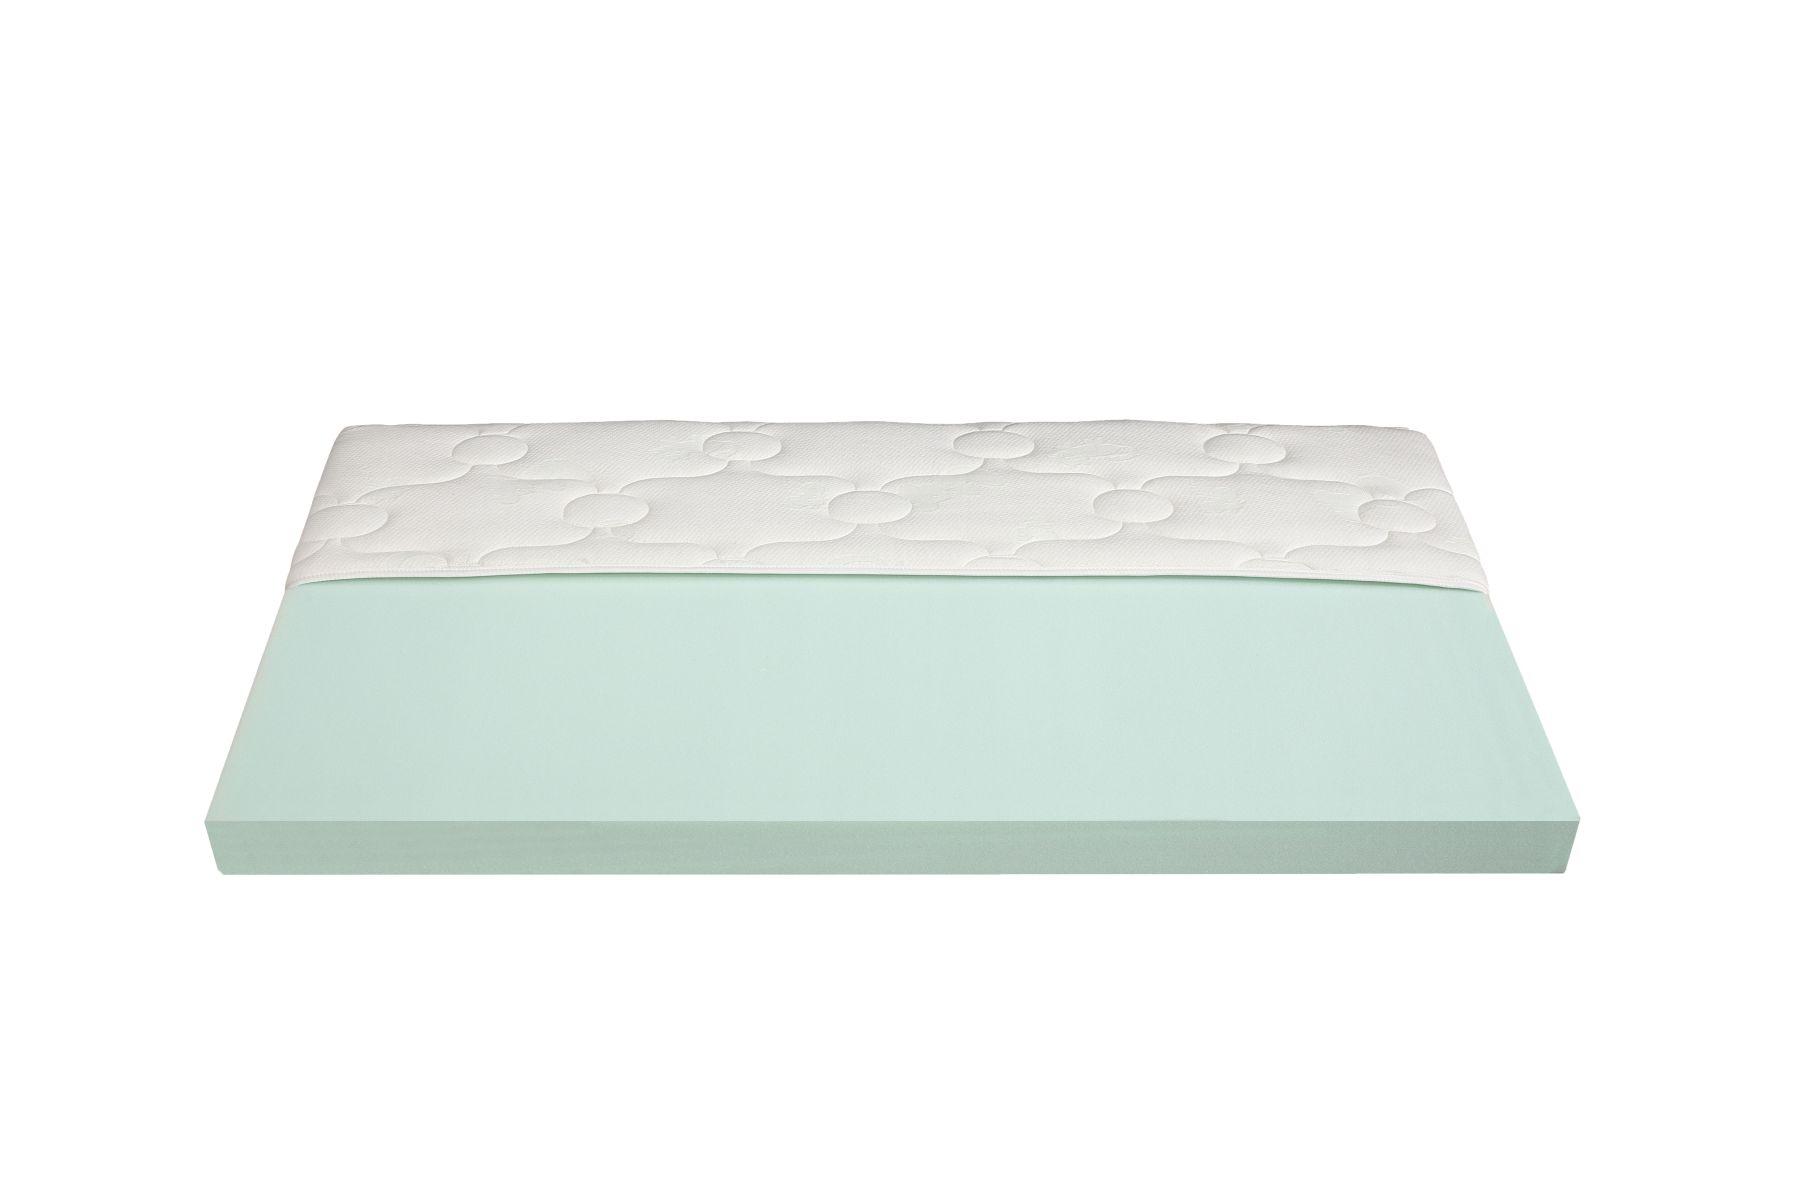 matratze f r kinder matratzen u topper eggers deutsche premiumprodukte. Black Bedroom Furniture Sets. Home Design Ideas